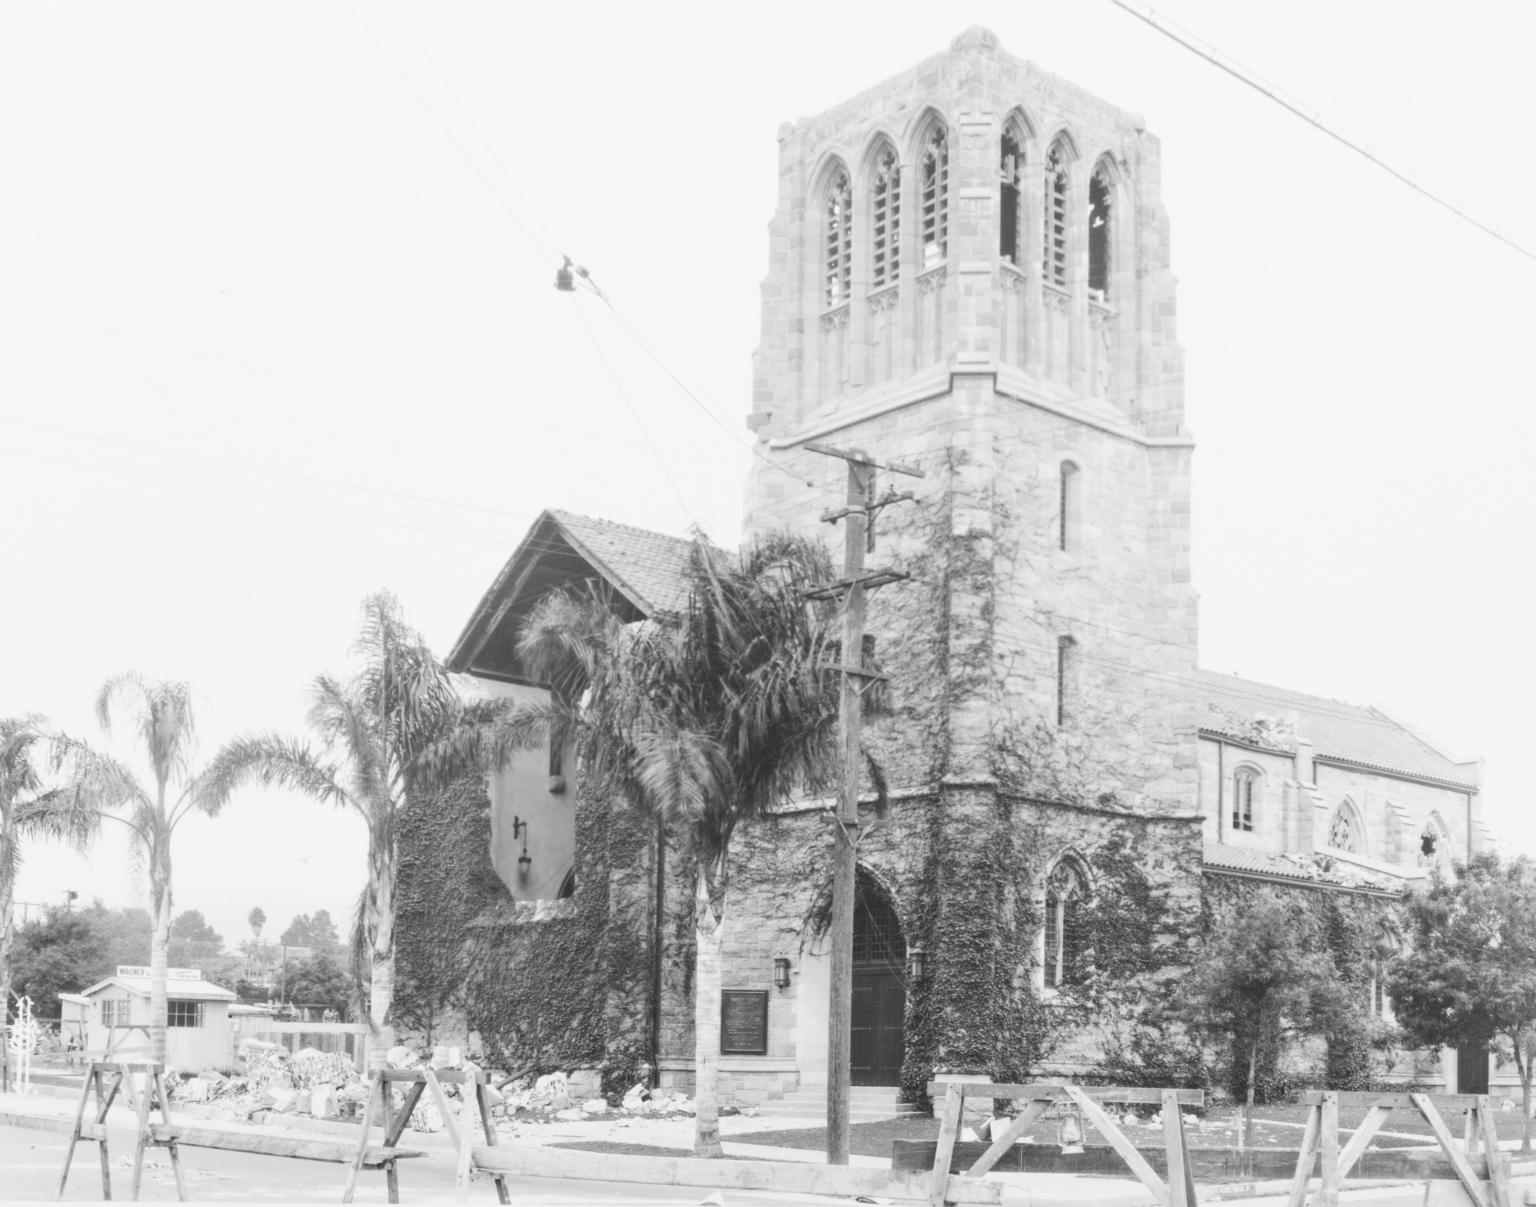 Santa Barbara 1925 Earthquake Damage - Church